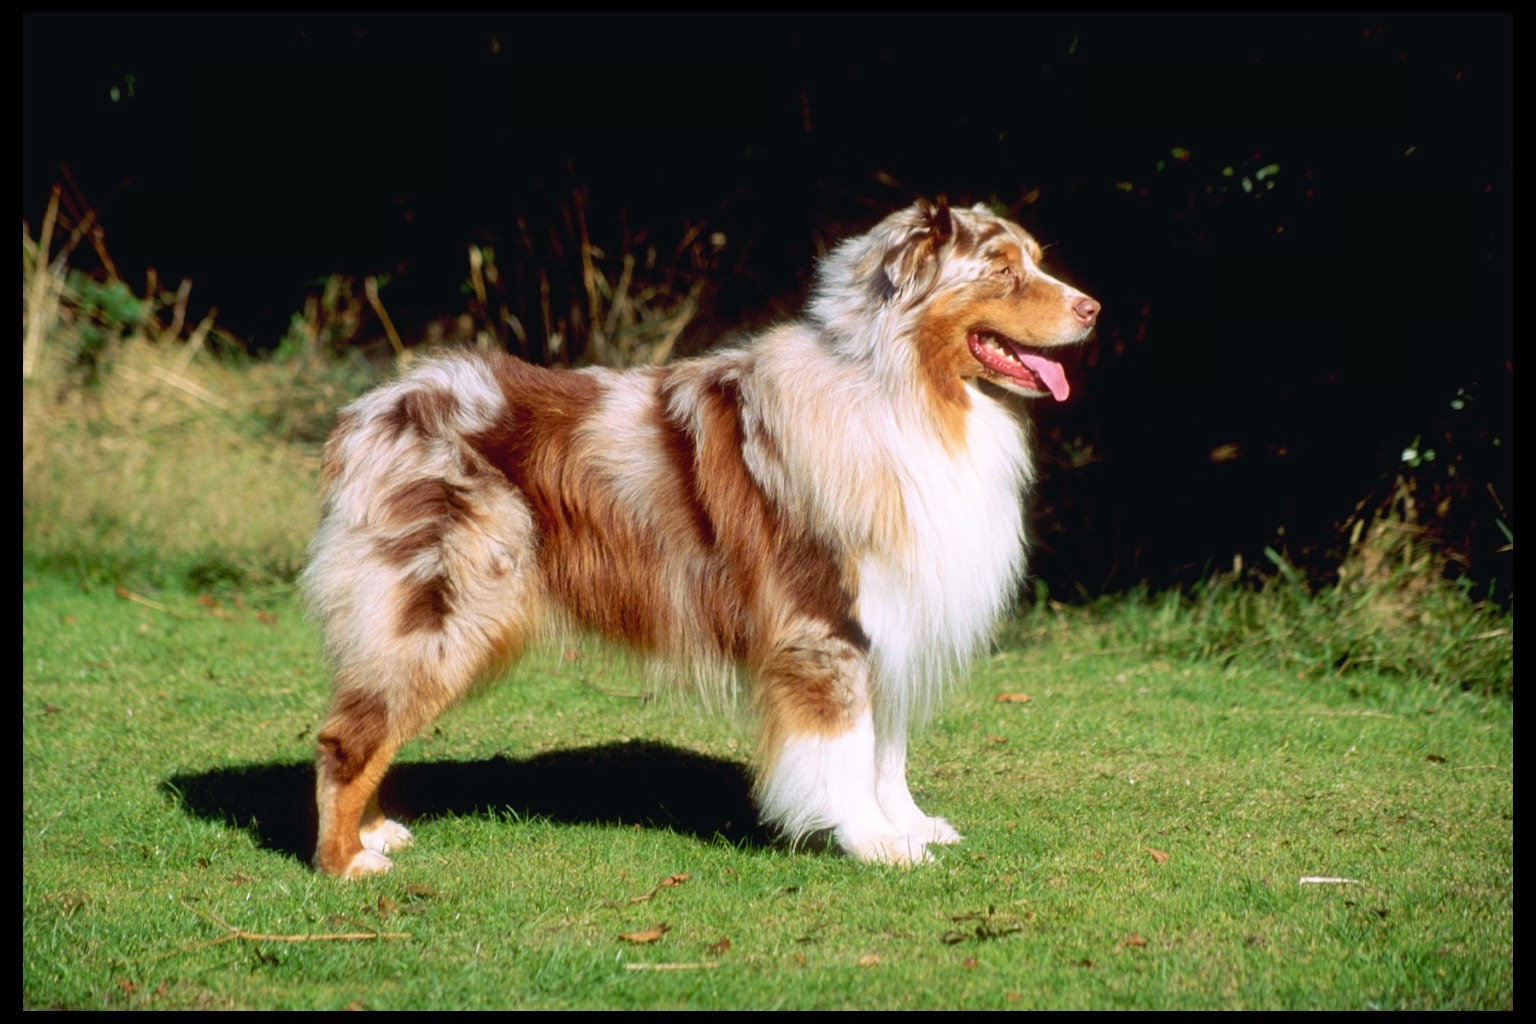 Dog Photo: The Australian Shepherd Dog Photo